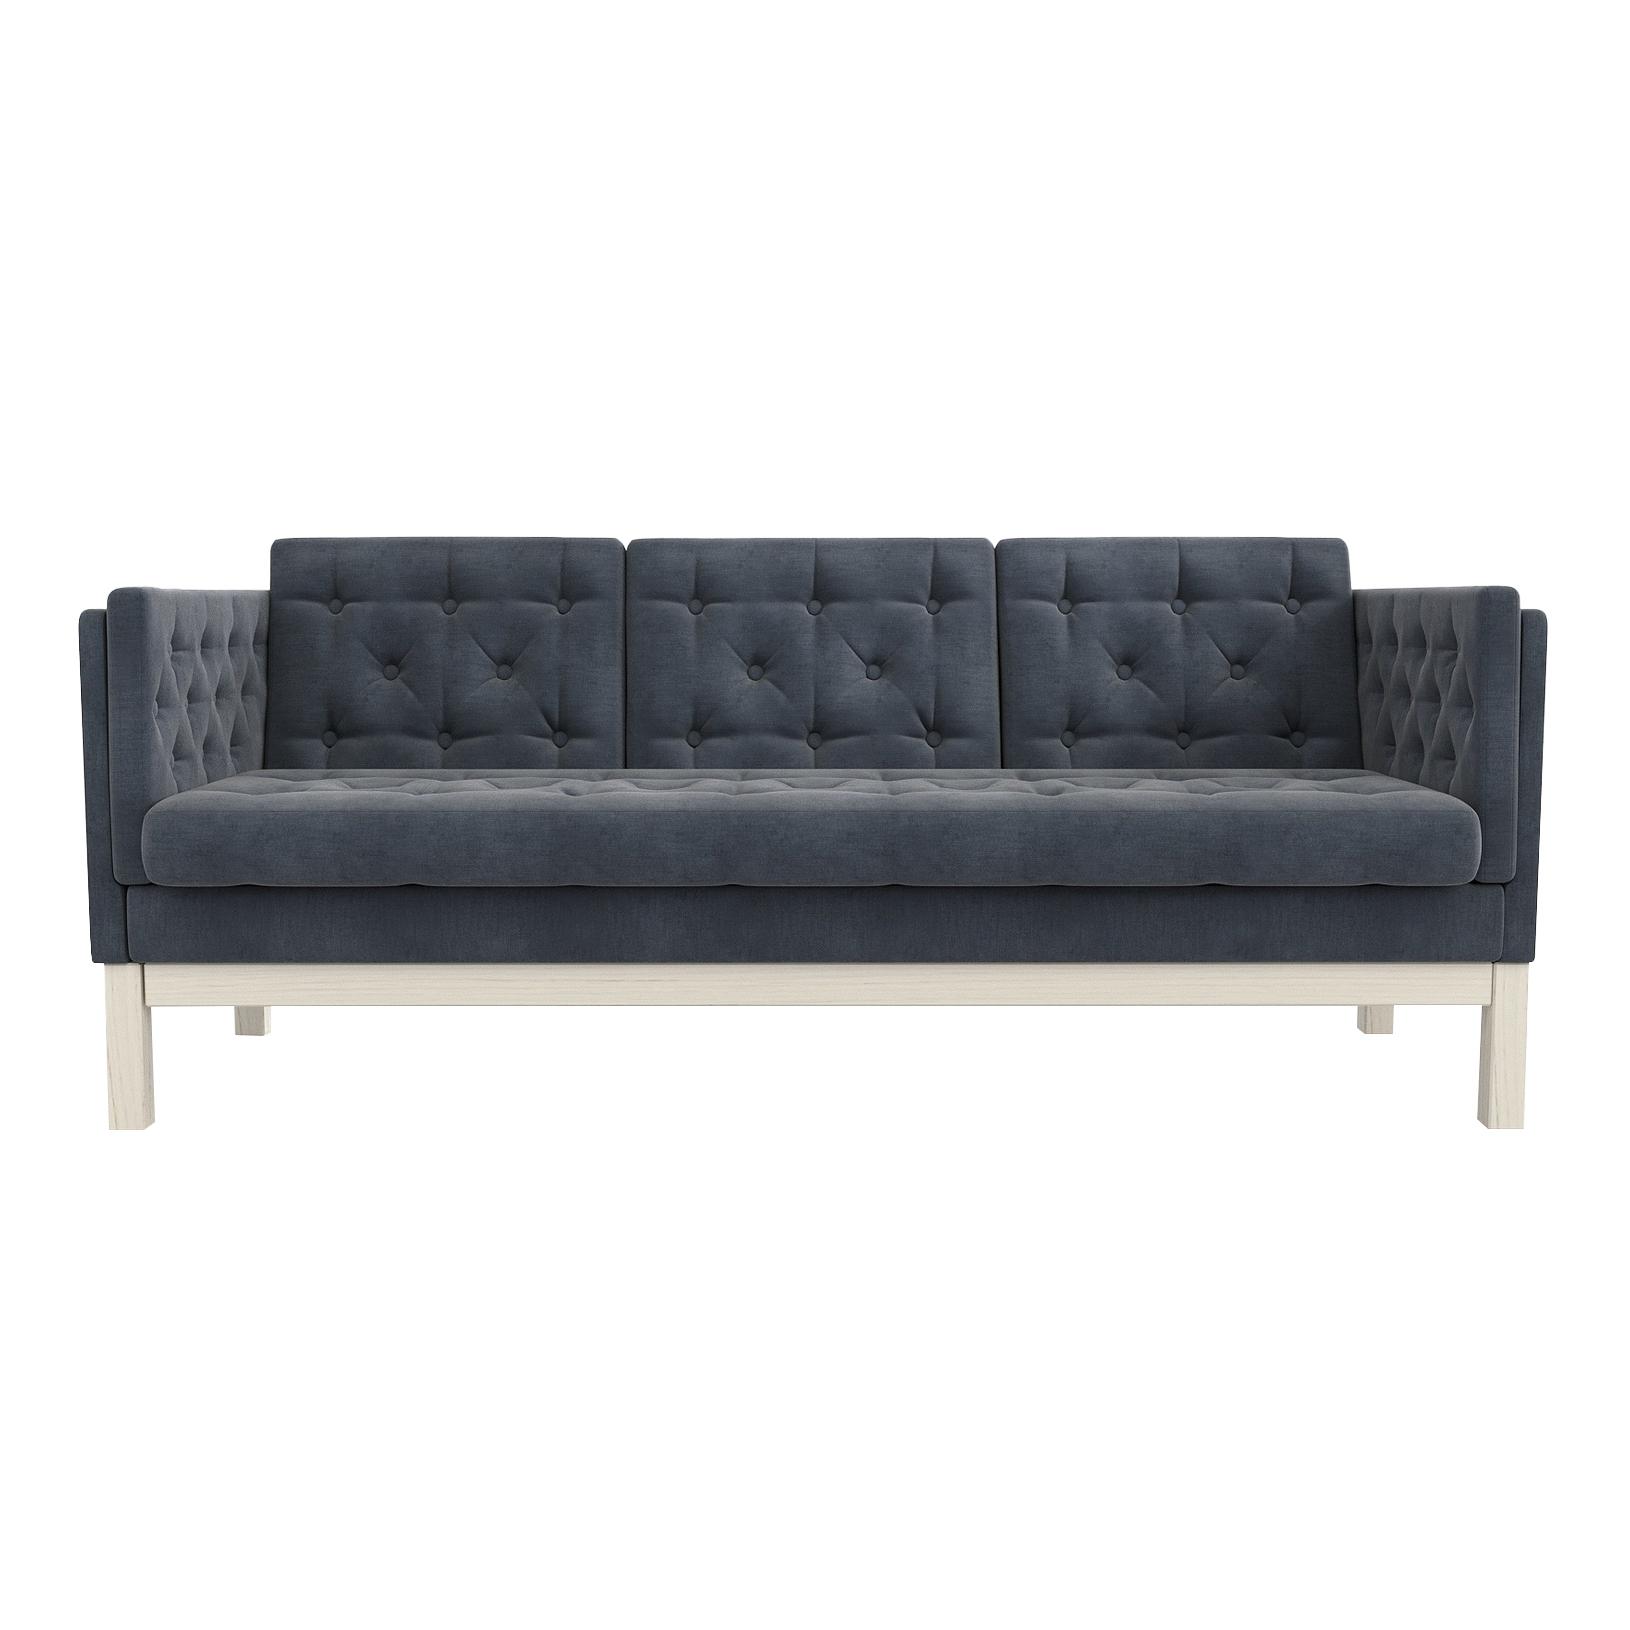 Фото - Диван AS Алана б 193x82x83 беленый дуб/серый диван as алана м 154x82x83 беленый дуб белый